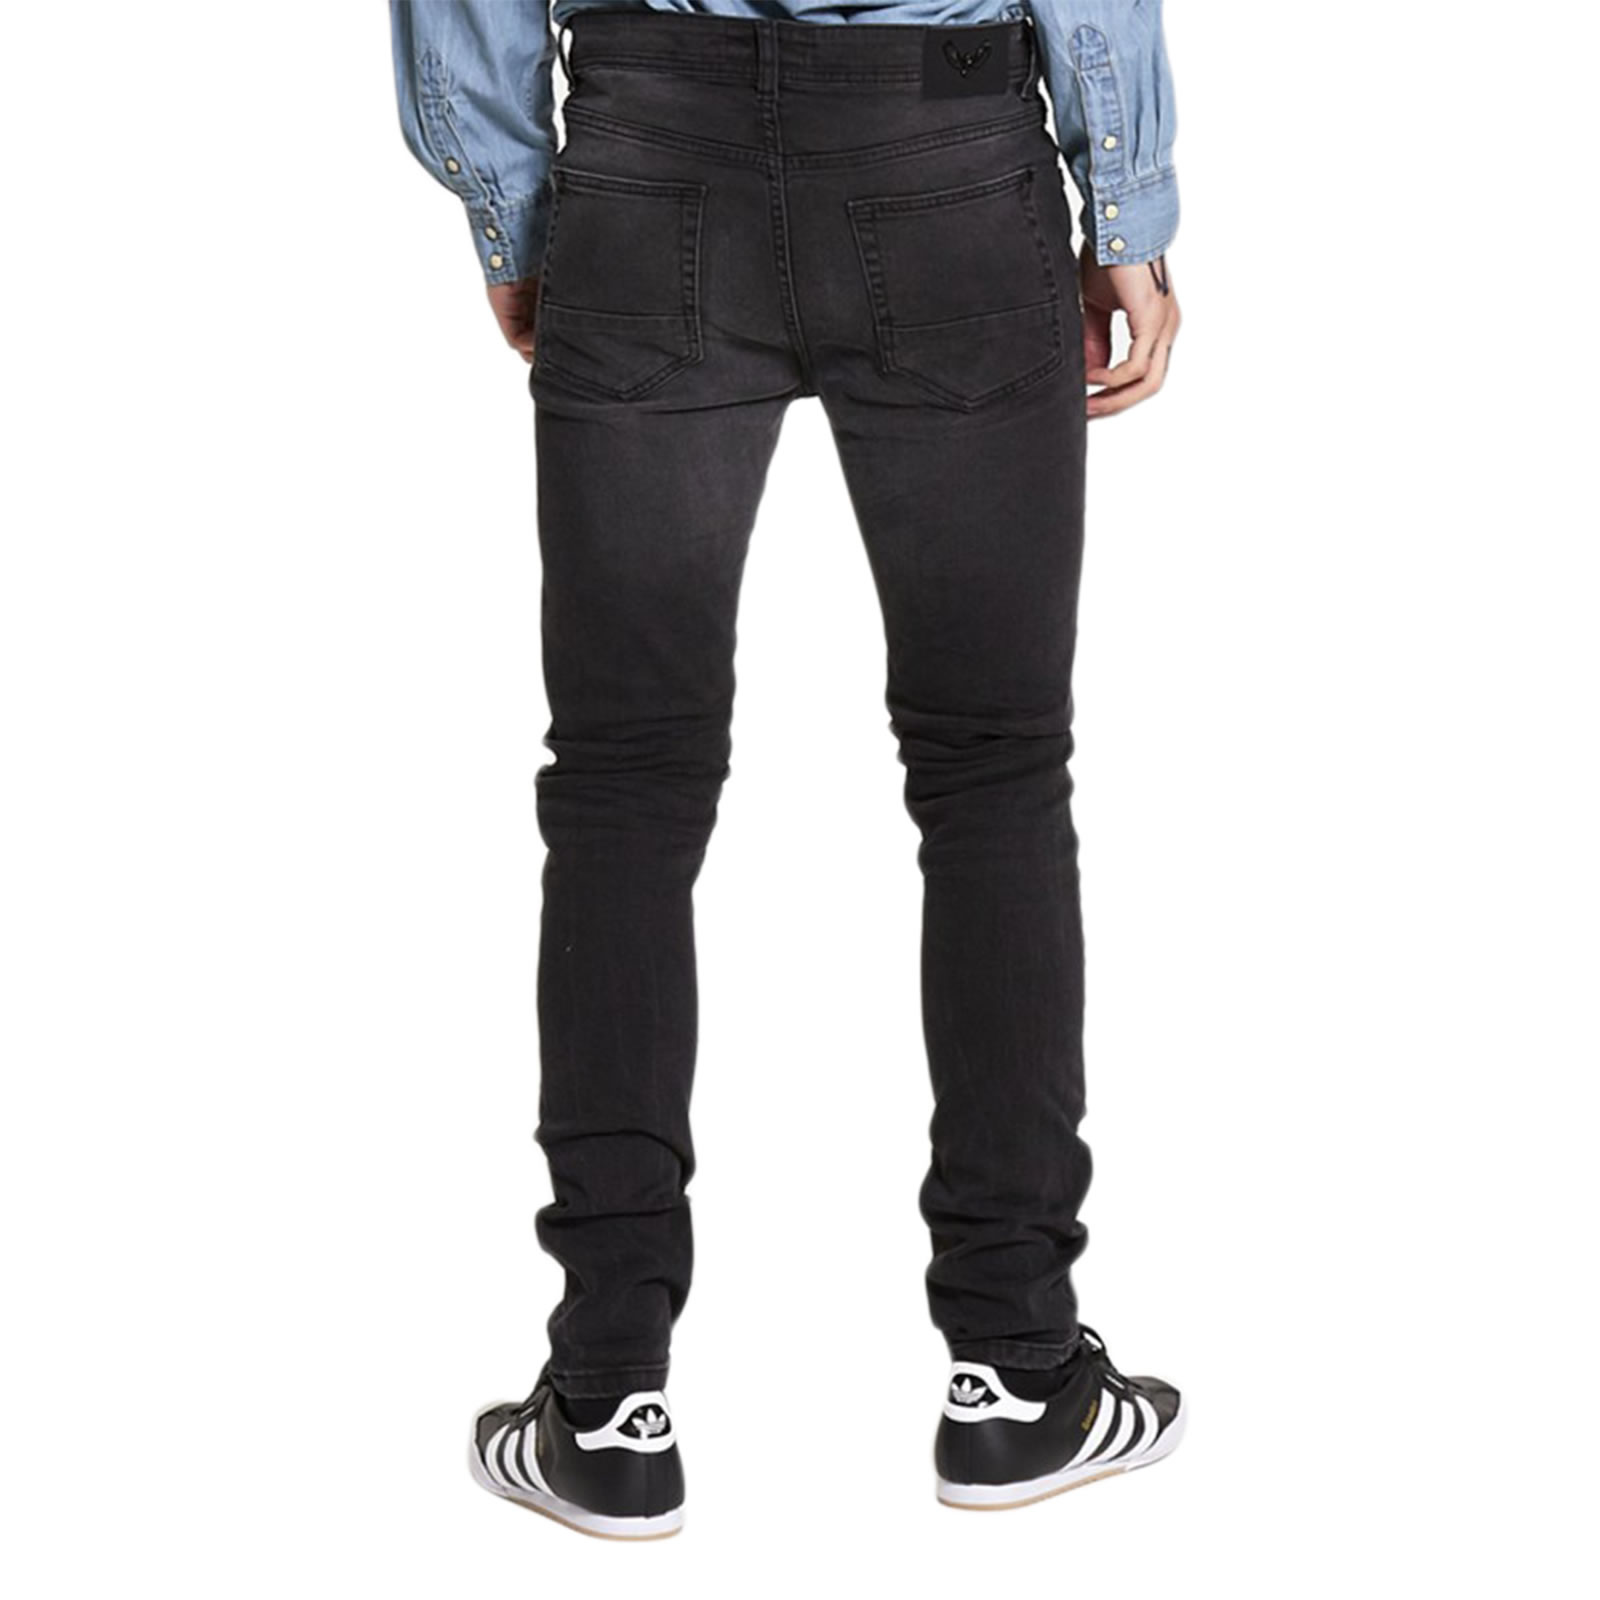 Mens Skinny Jeans Brave Soul Joe Stretch Distressed Black Wash ...